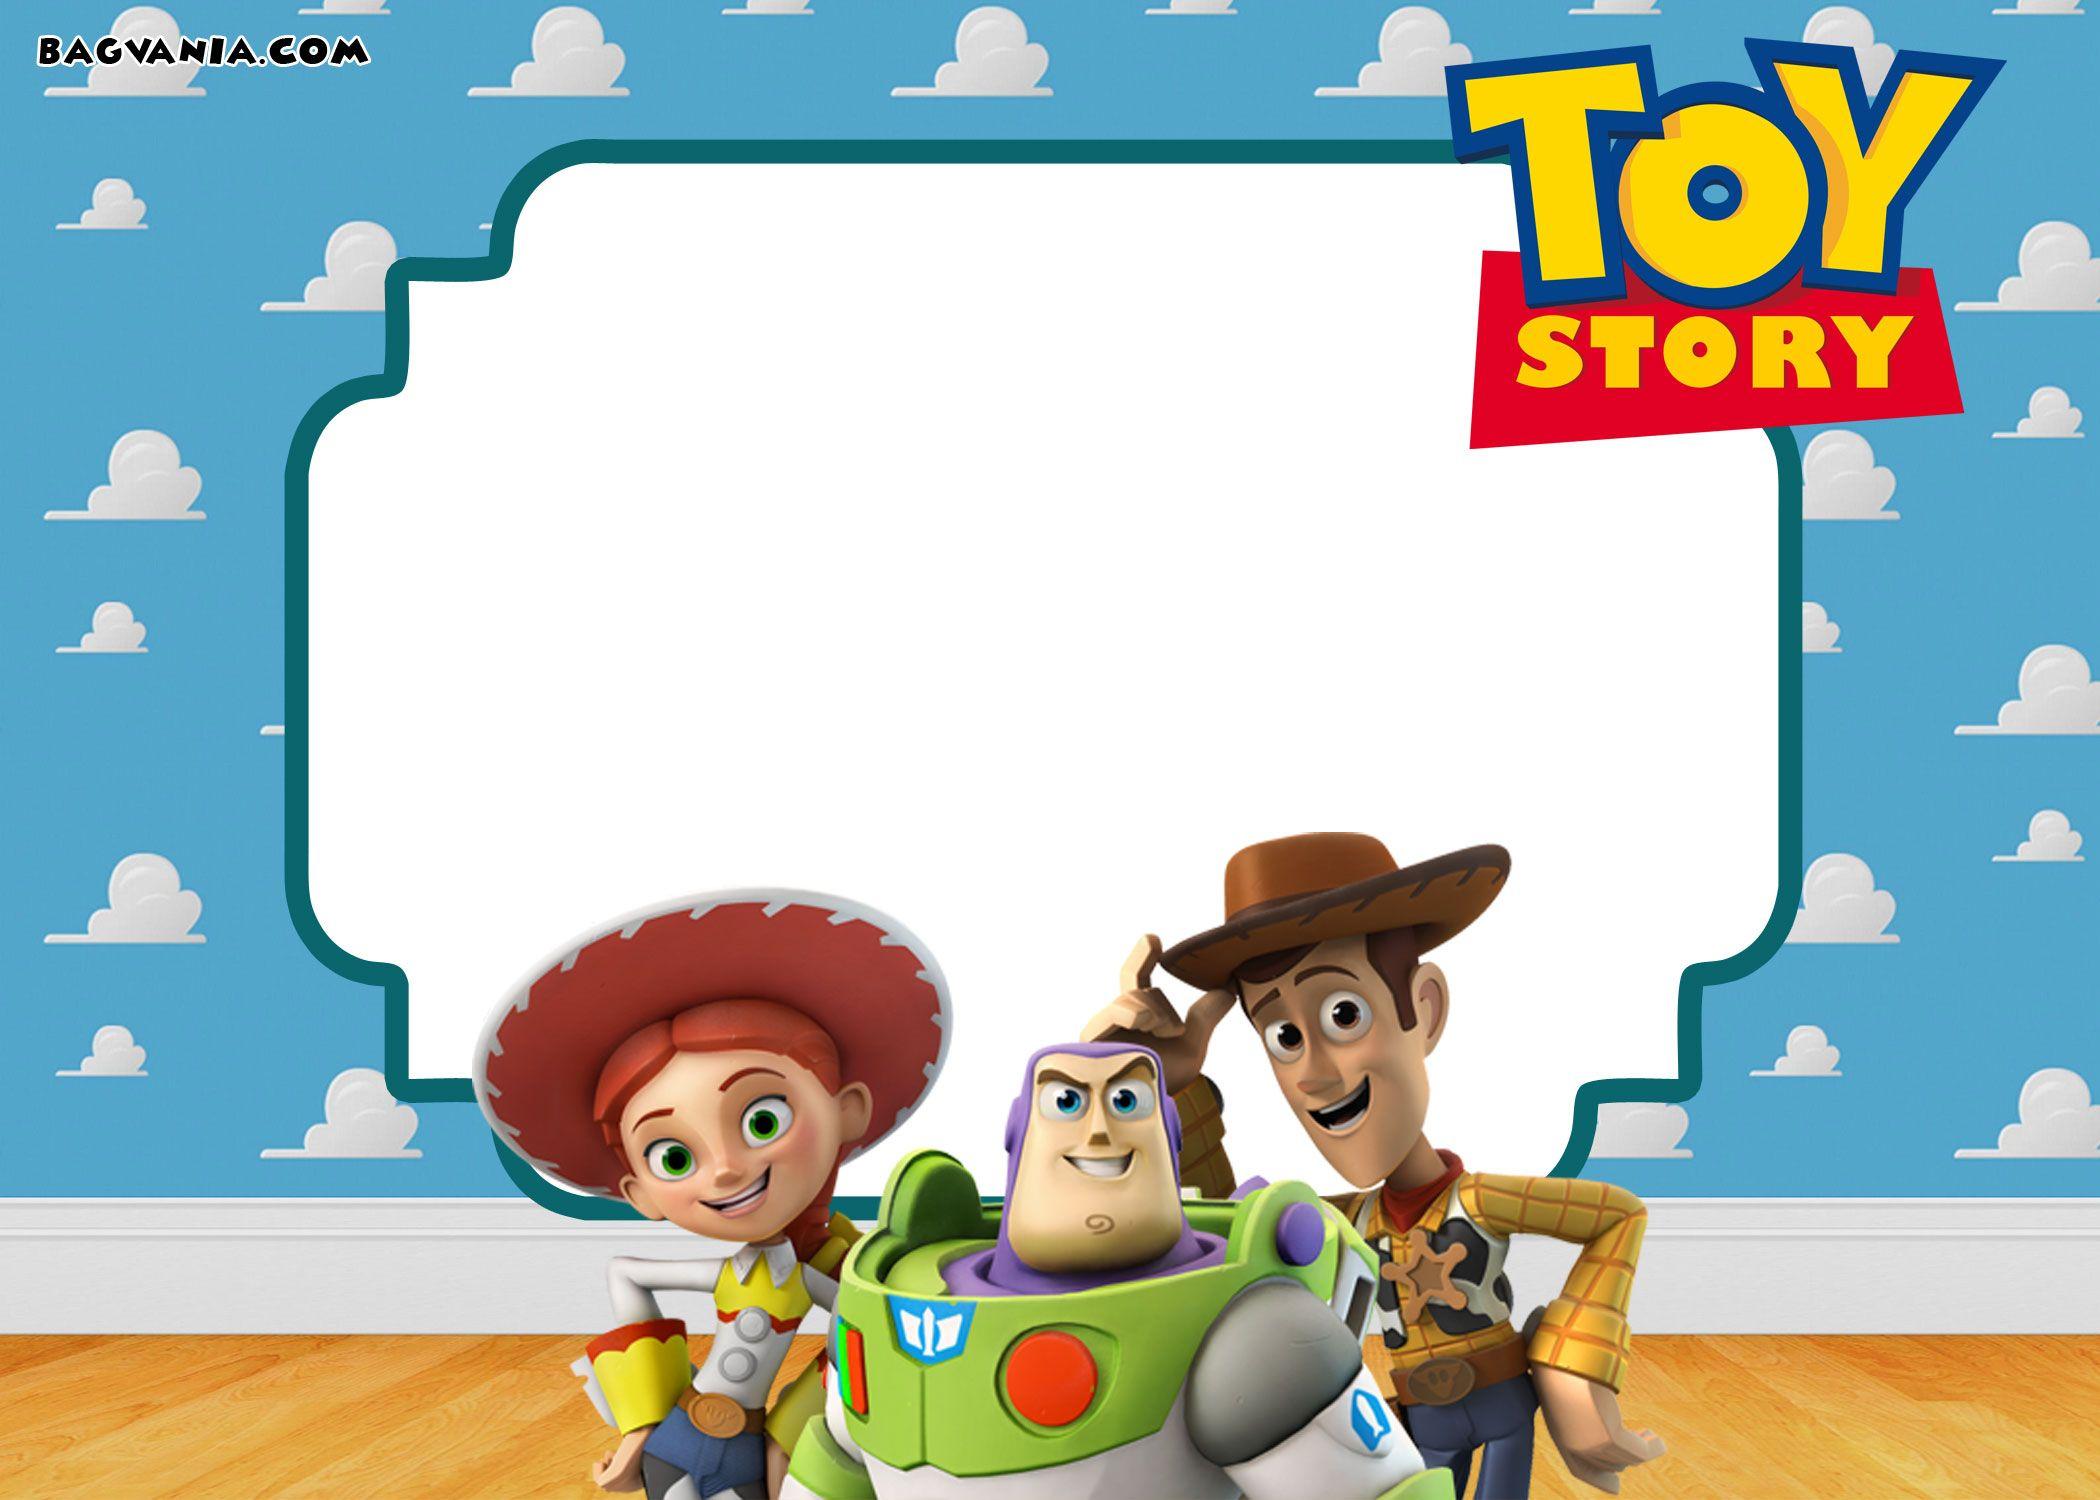 Free Printable Toy Story 3 Birthday Invitations | Free Printable - Toy Story Birthday Card Printable Free